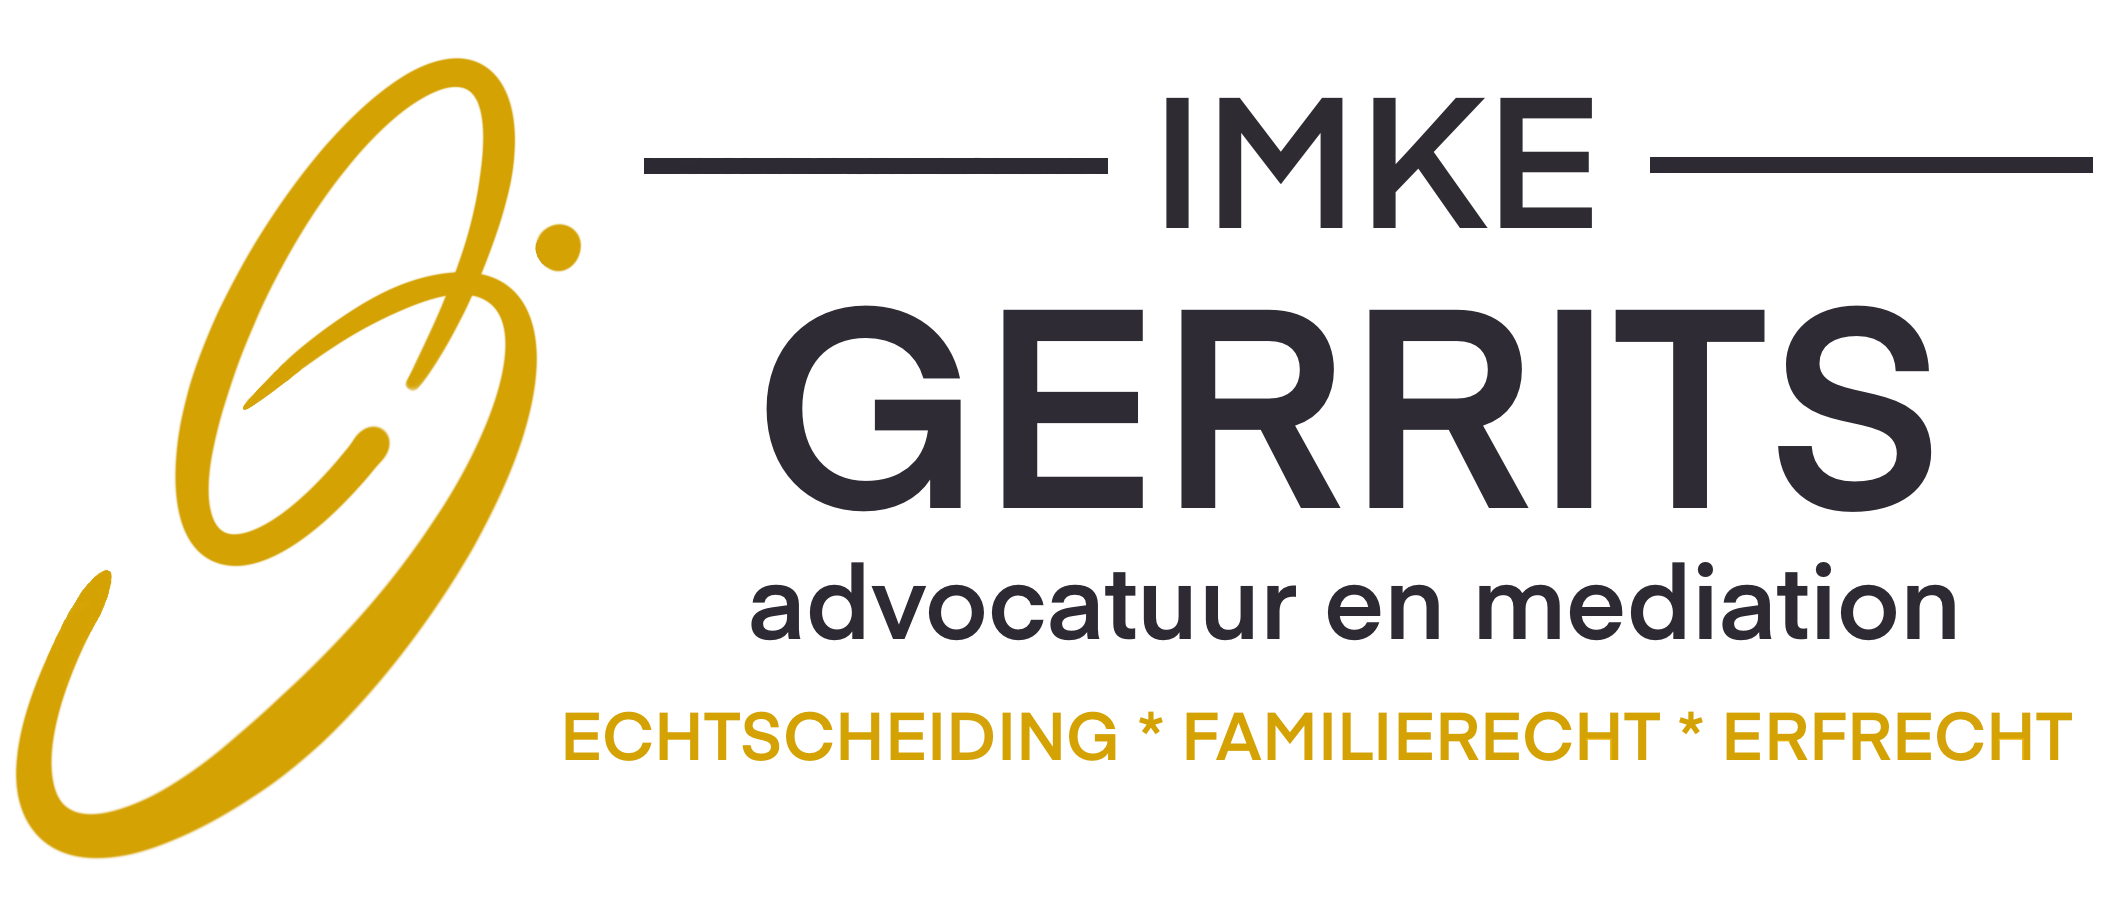 Imke Gerrits Advocatuur en Mediation